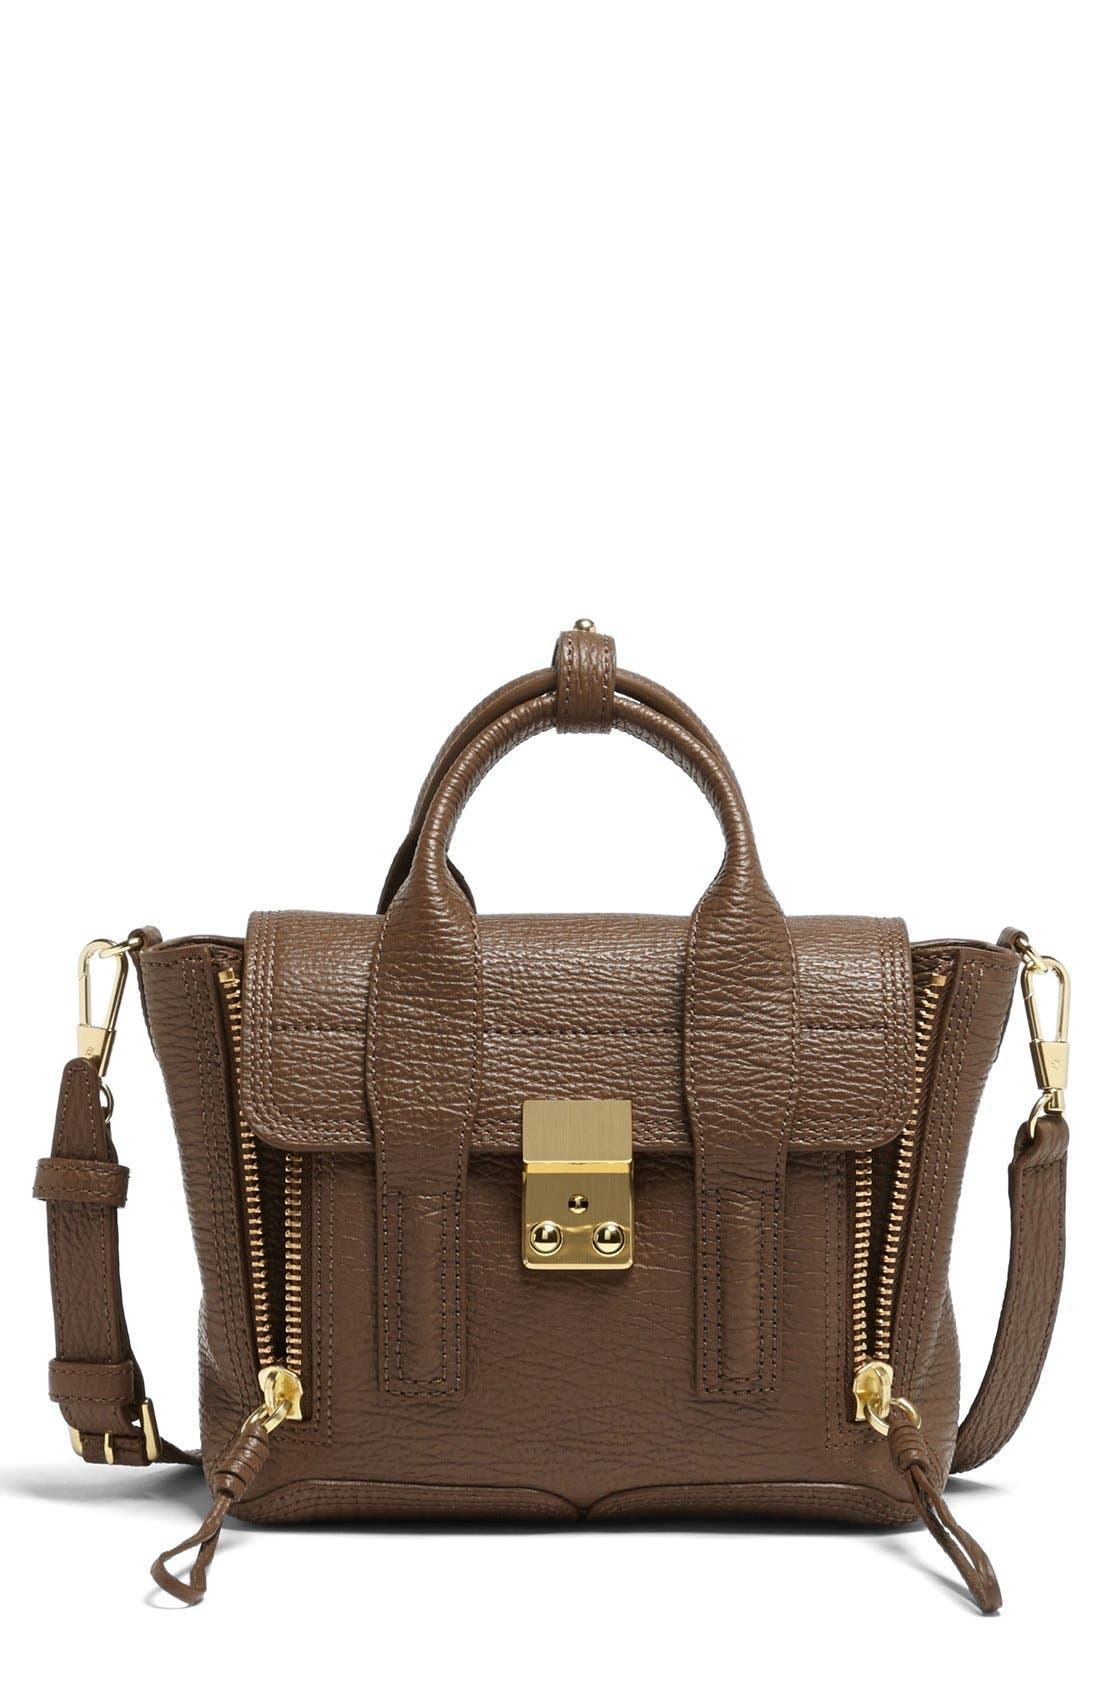 3.1 Phillip Lim 'Mini Pashli' Leather Satchel